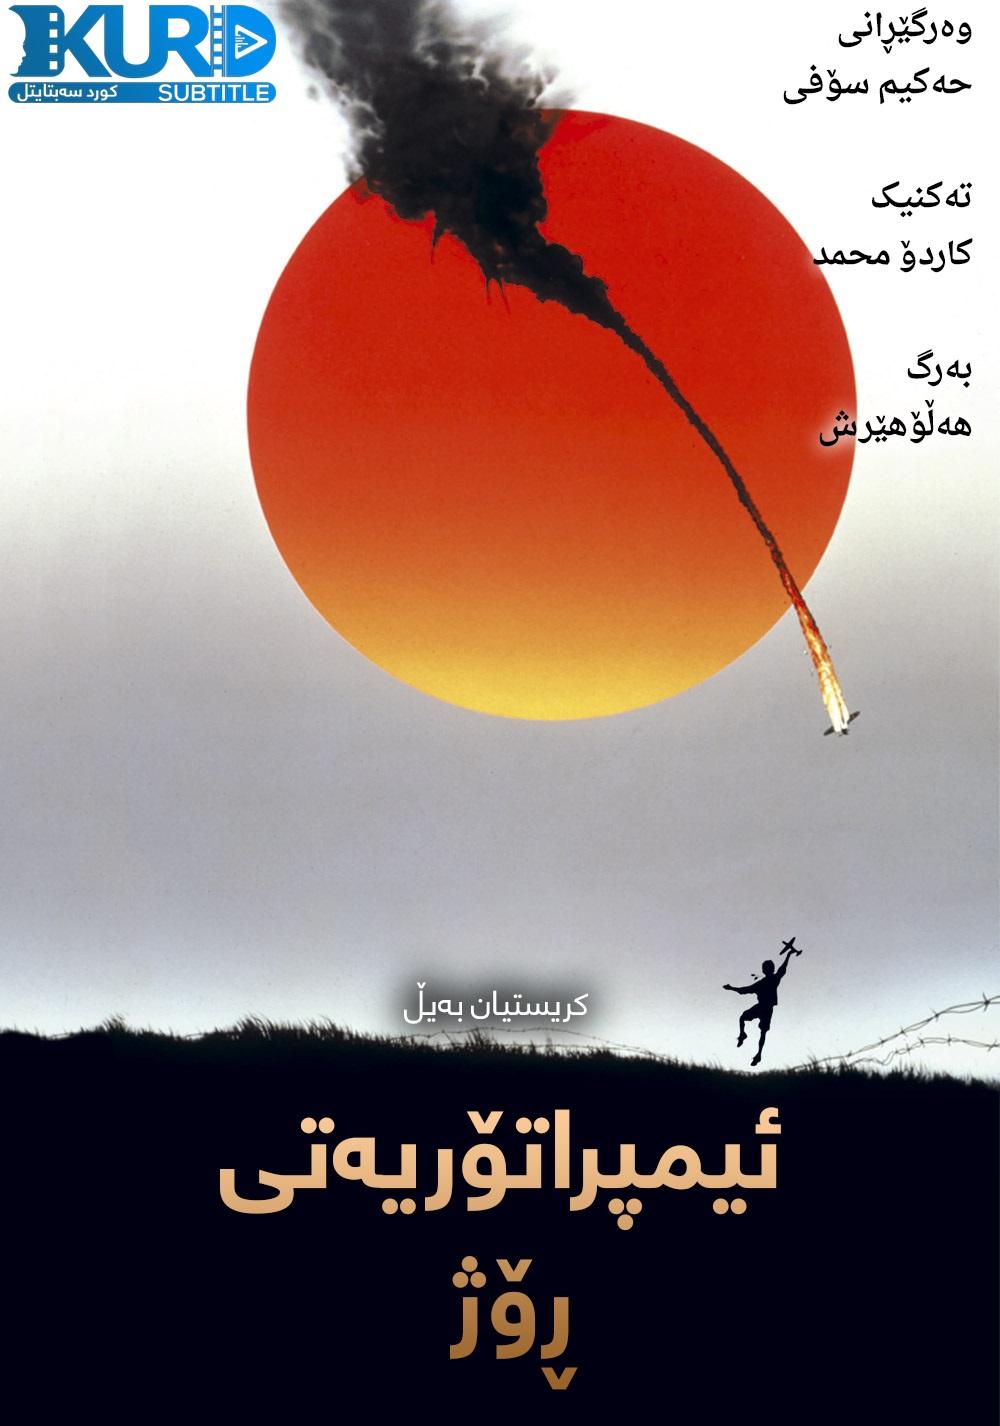 Empire of the Sun kurdish poster